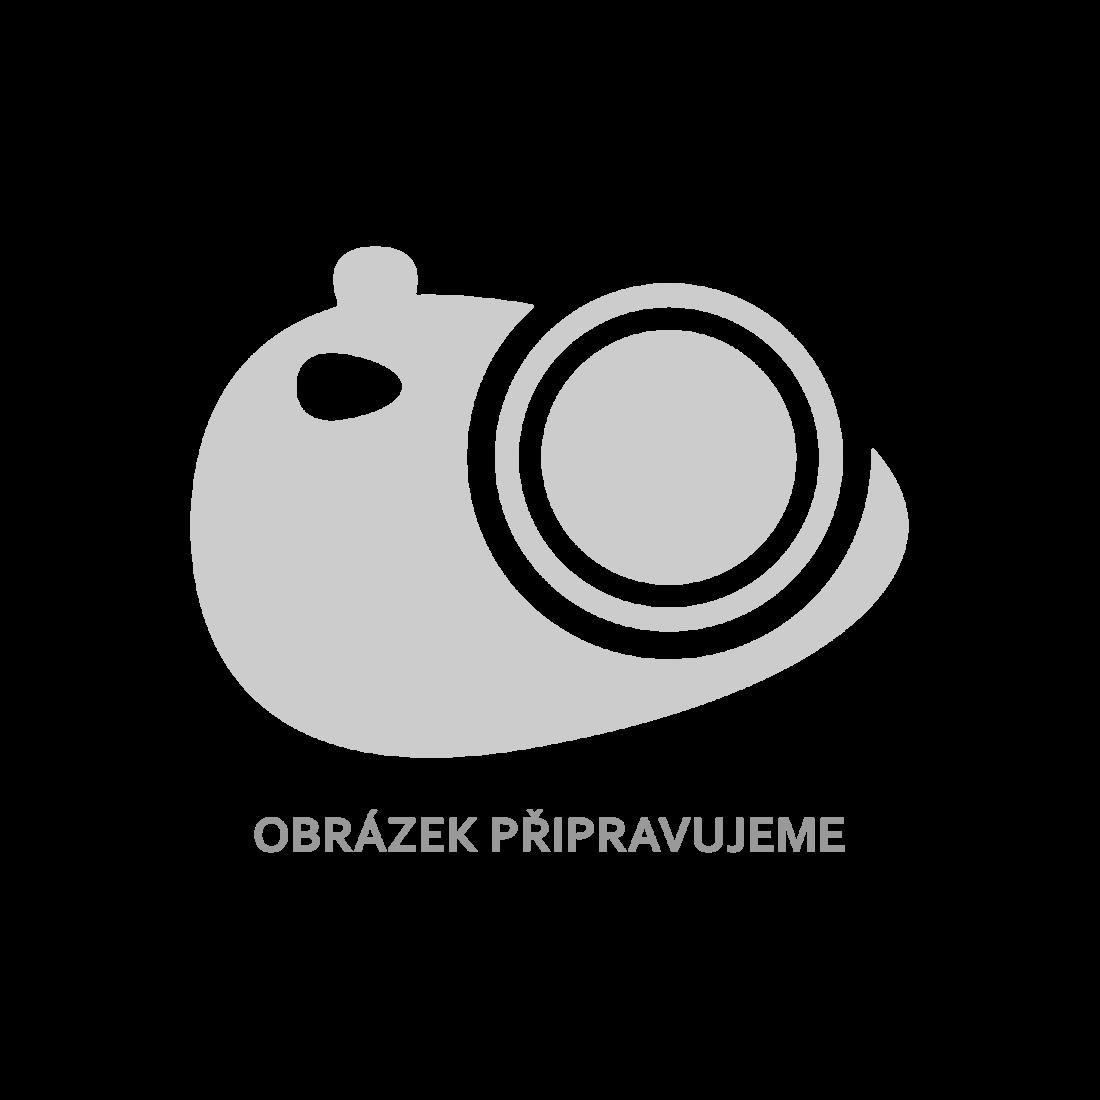 vidaXL Sedací puf tmavě hnědý 40 x 40 x 40 cm pravá kozí kůže [248127]